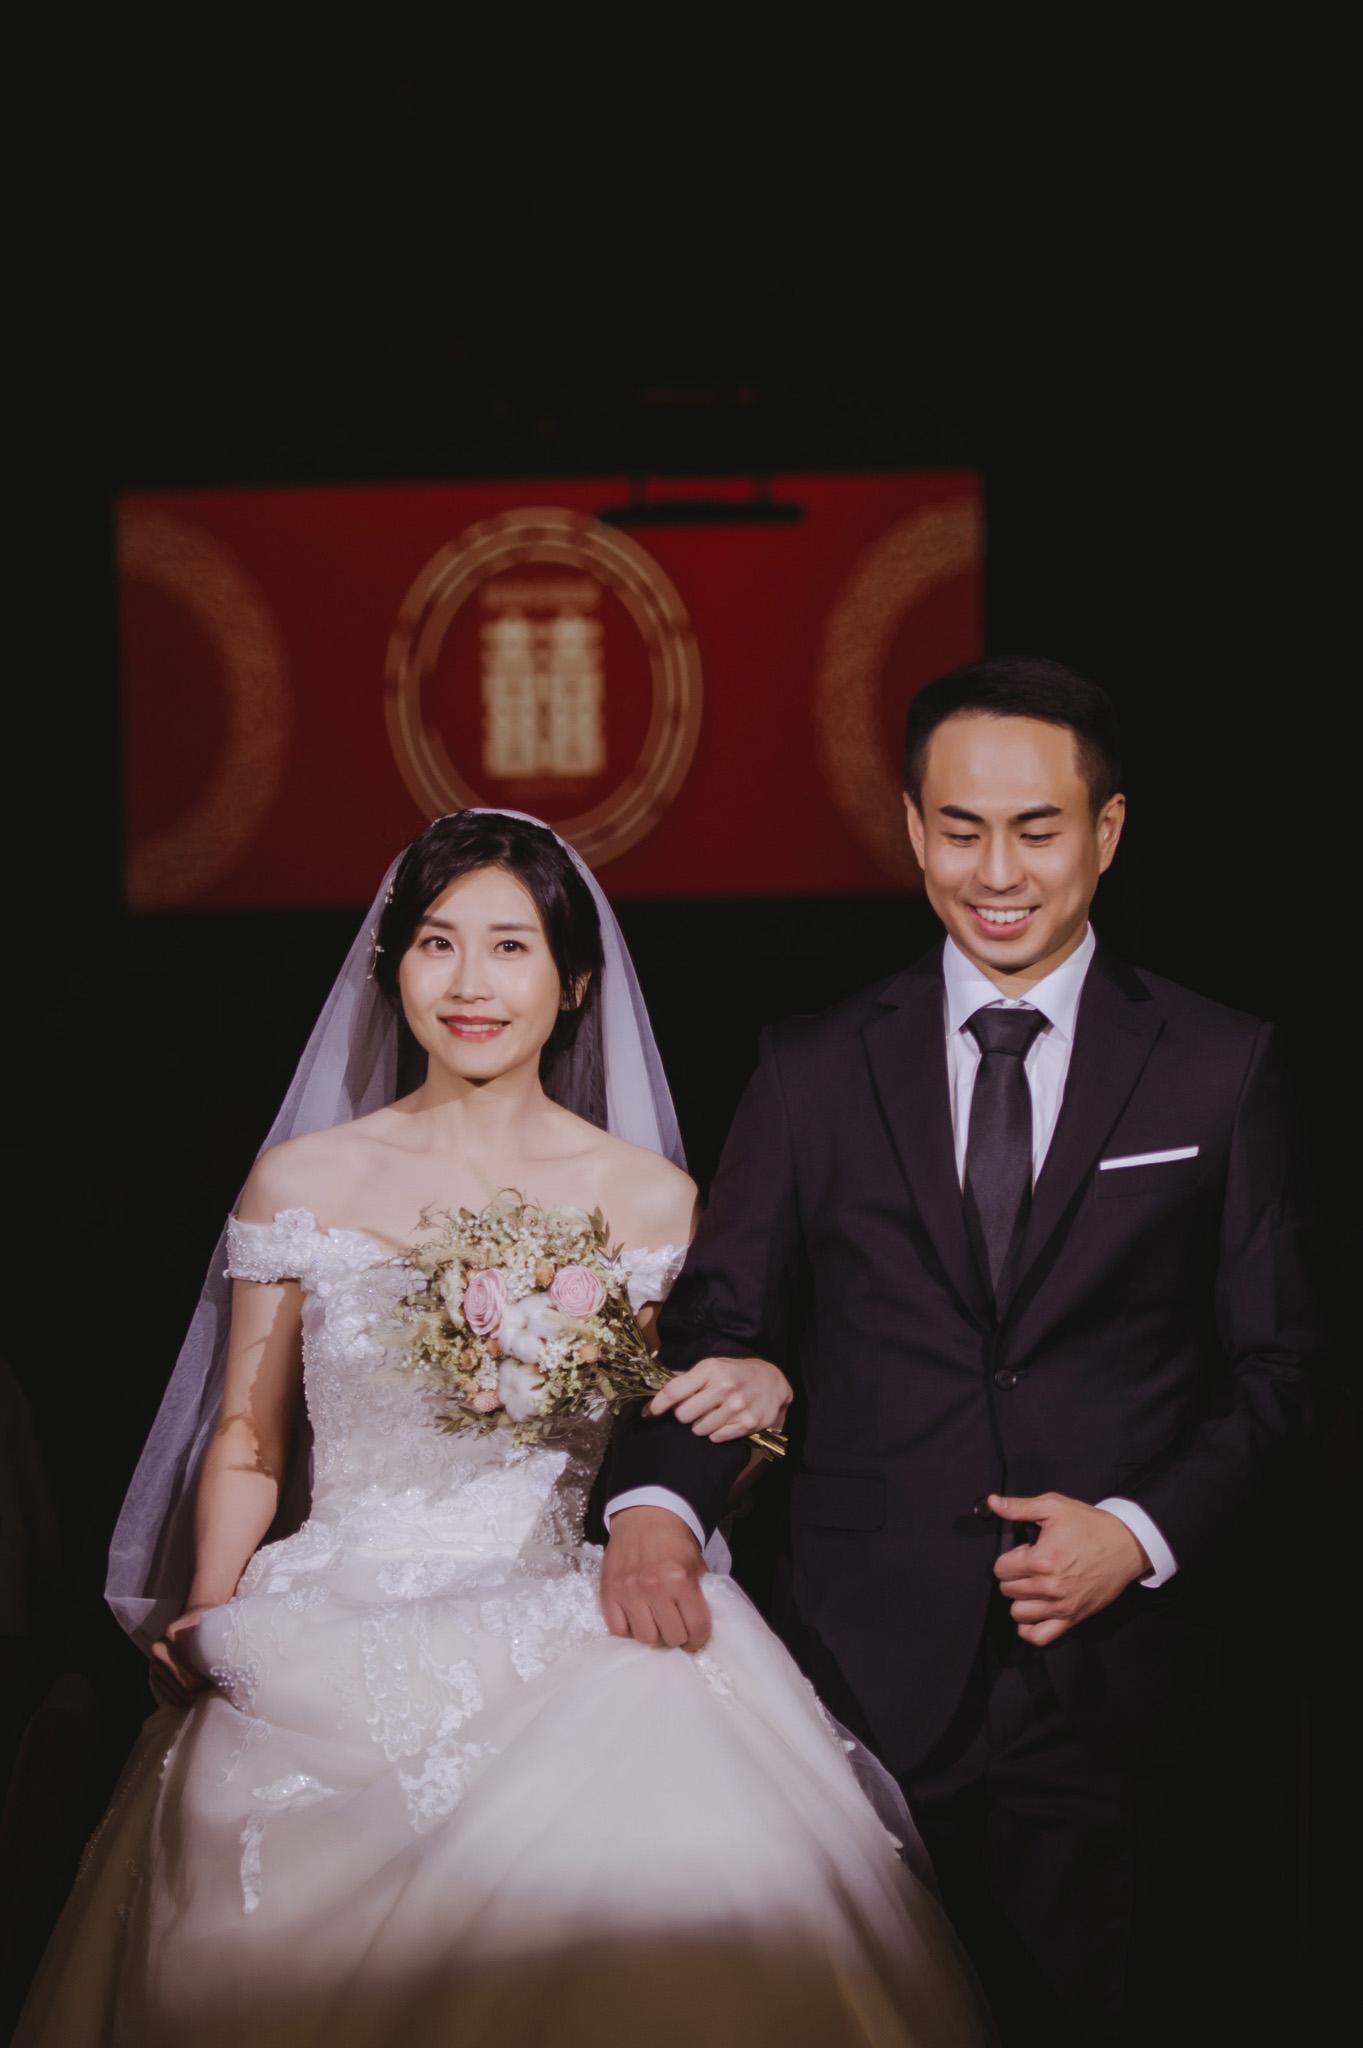 EW 居米 台北禮服 台北婚紗 台北婚攝 國泰萬怡 台北婚禮-22